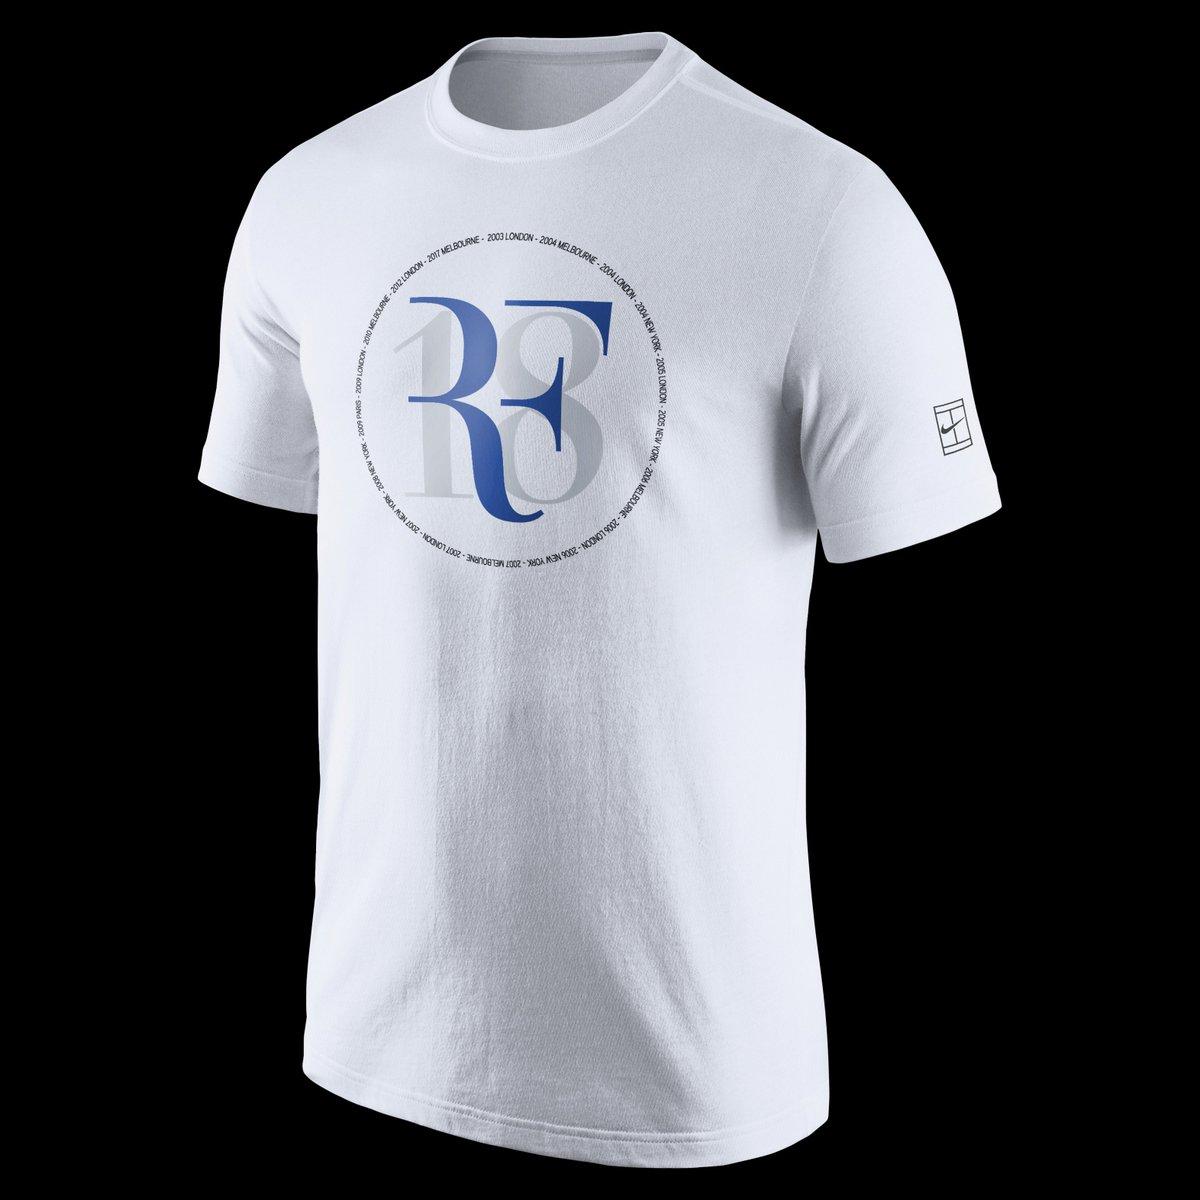 Tennis Express On Twitter Congratulations Rogerfederer The